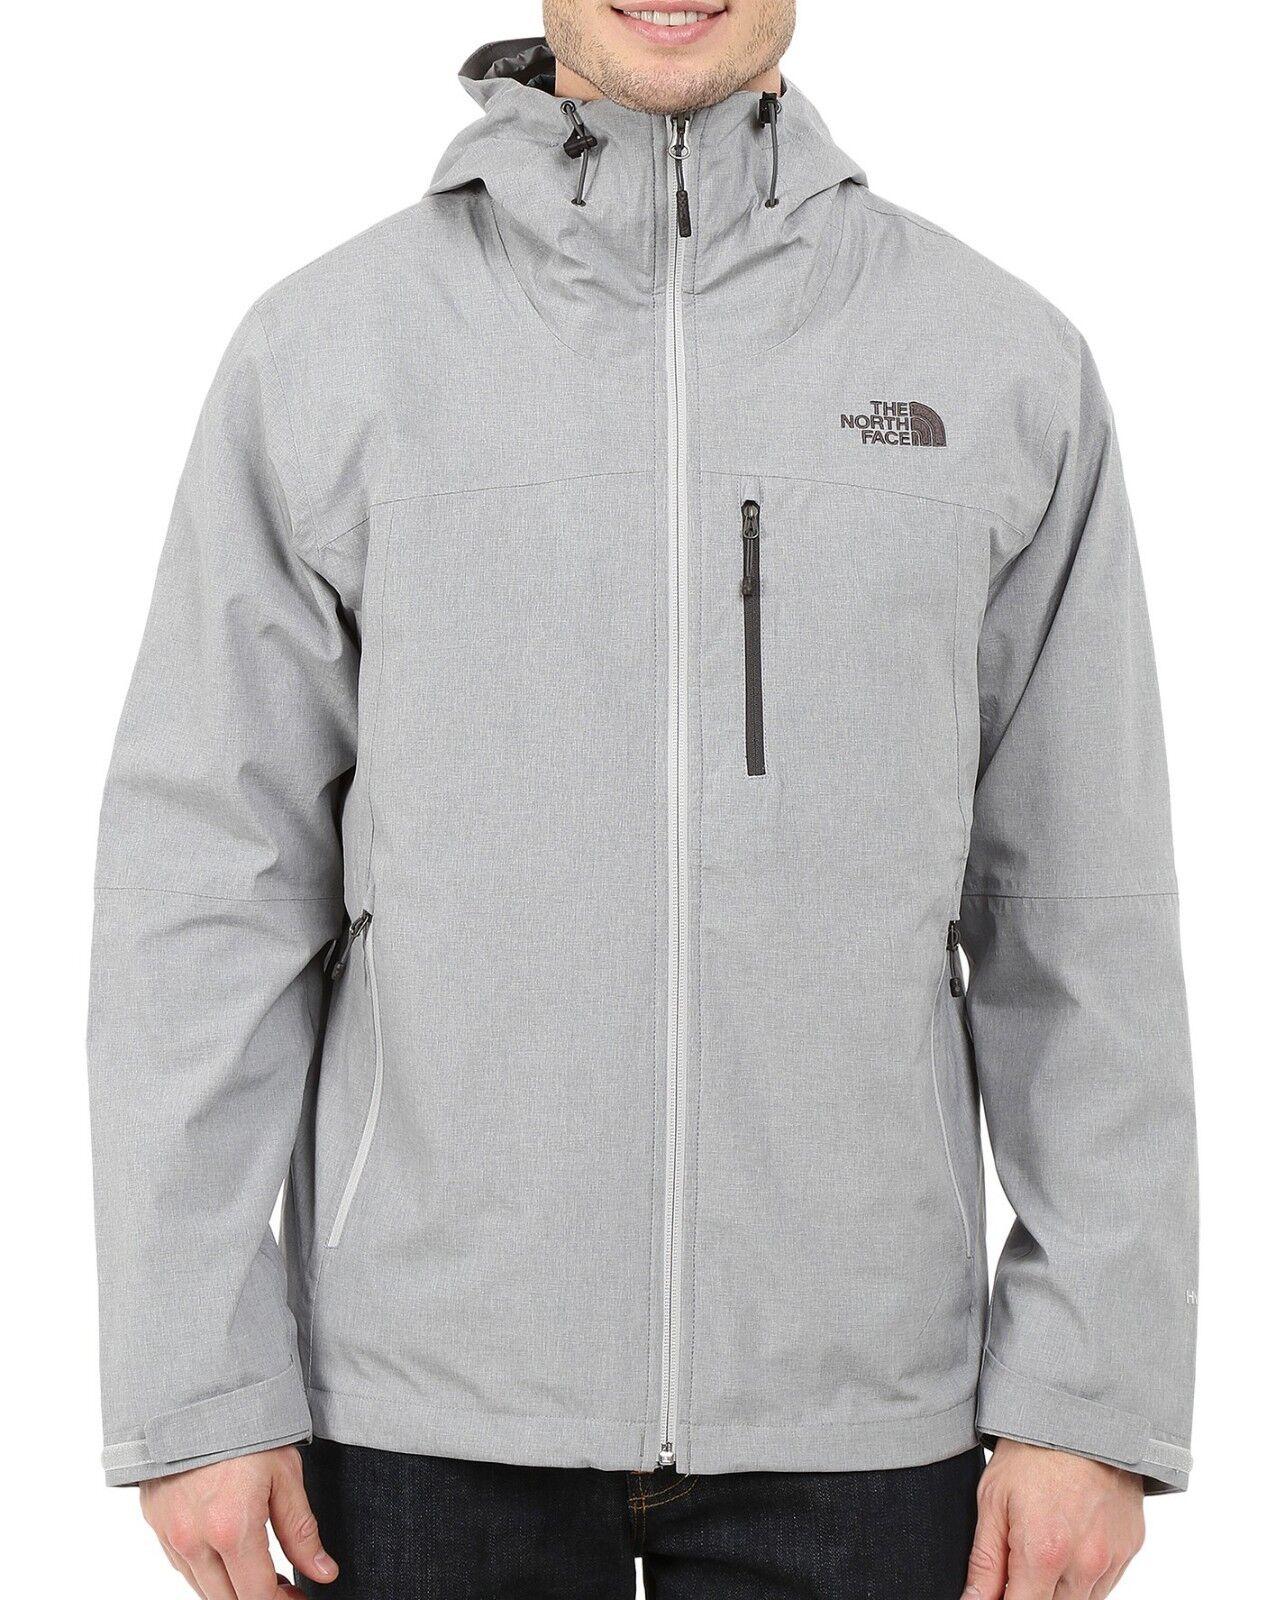 Triclimate jacket 3xl